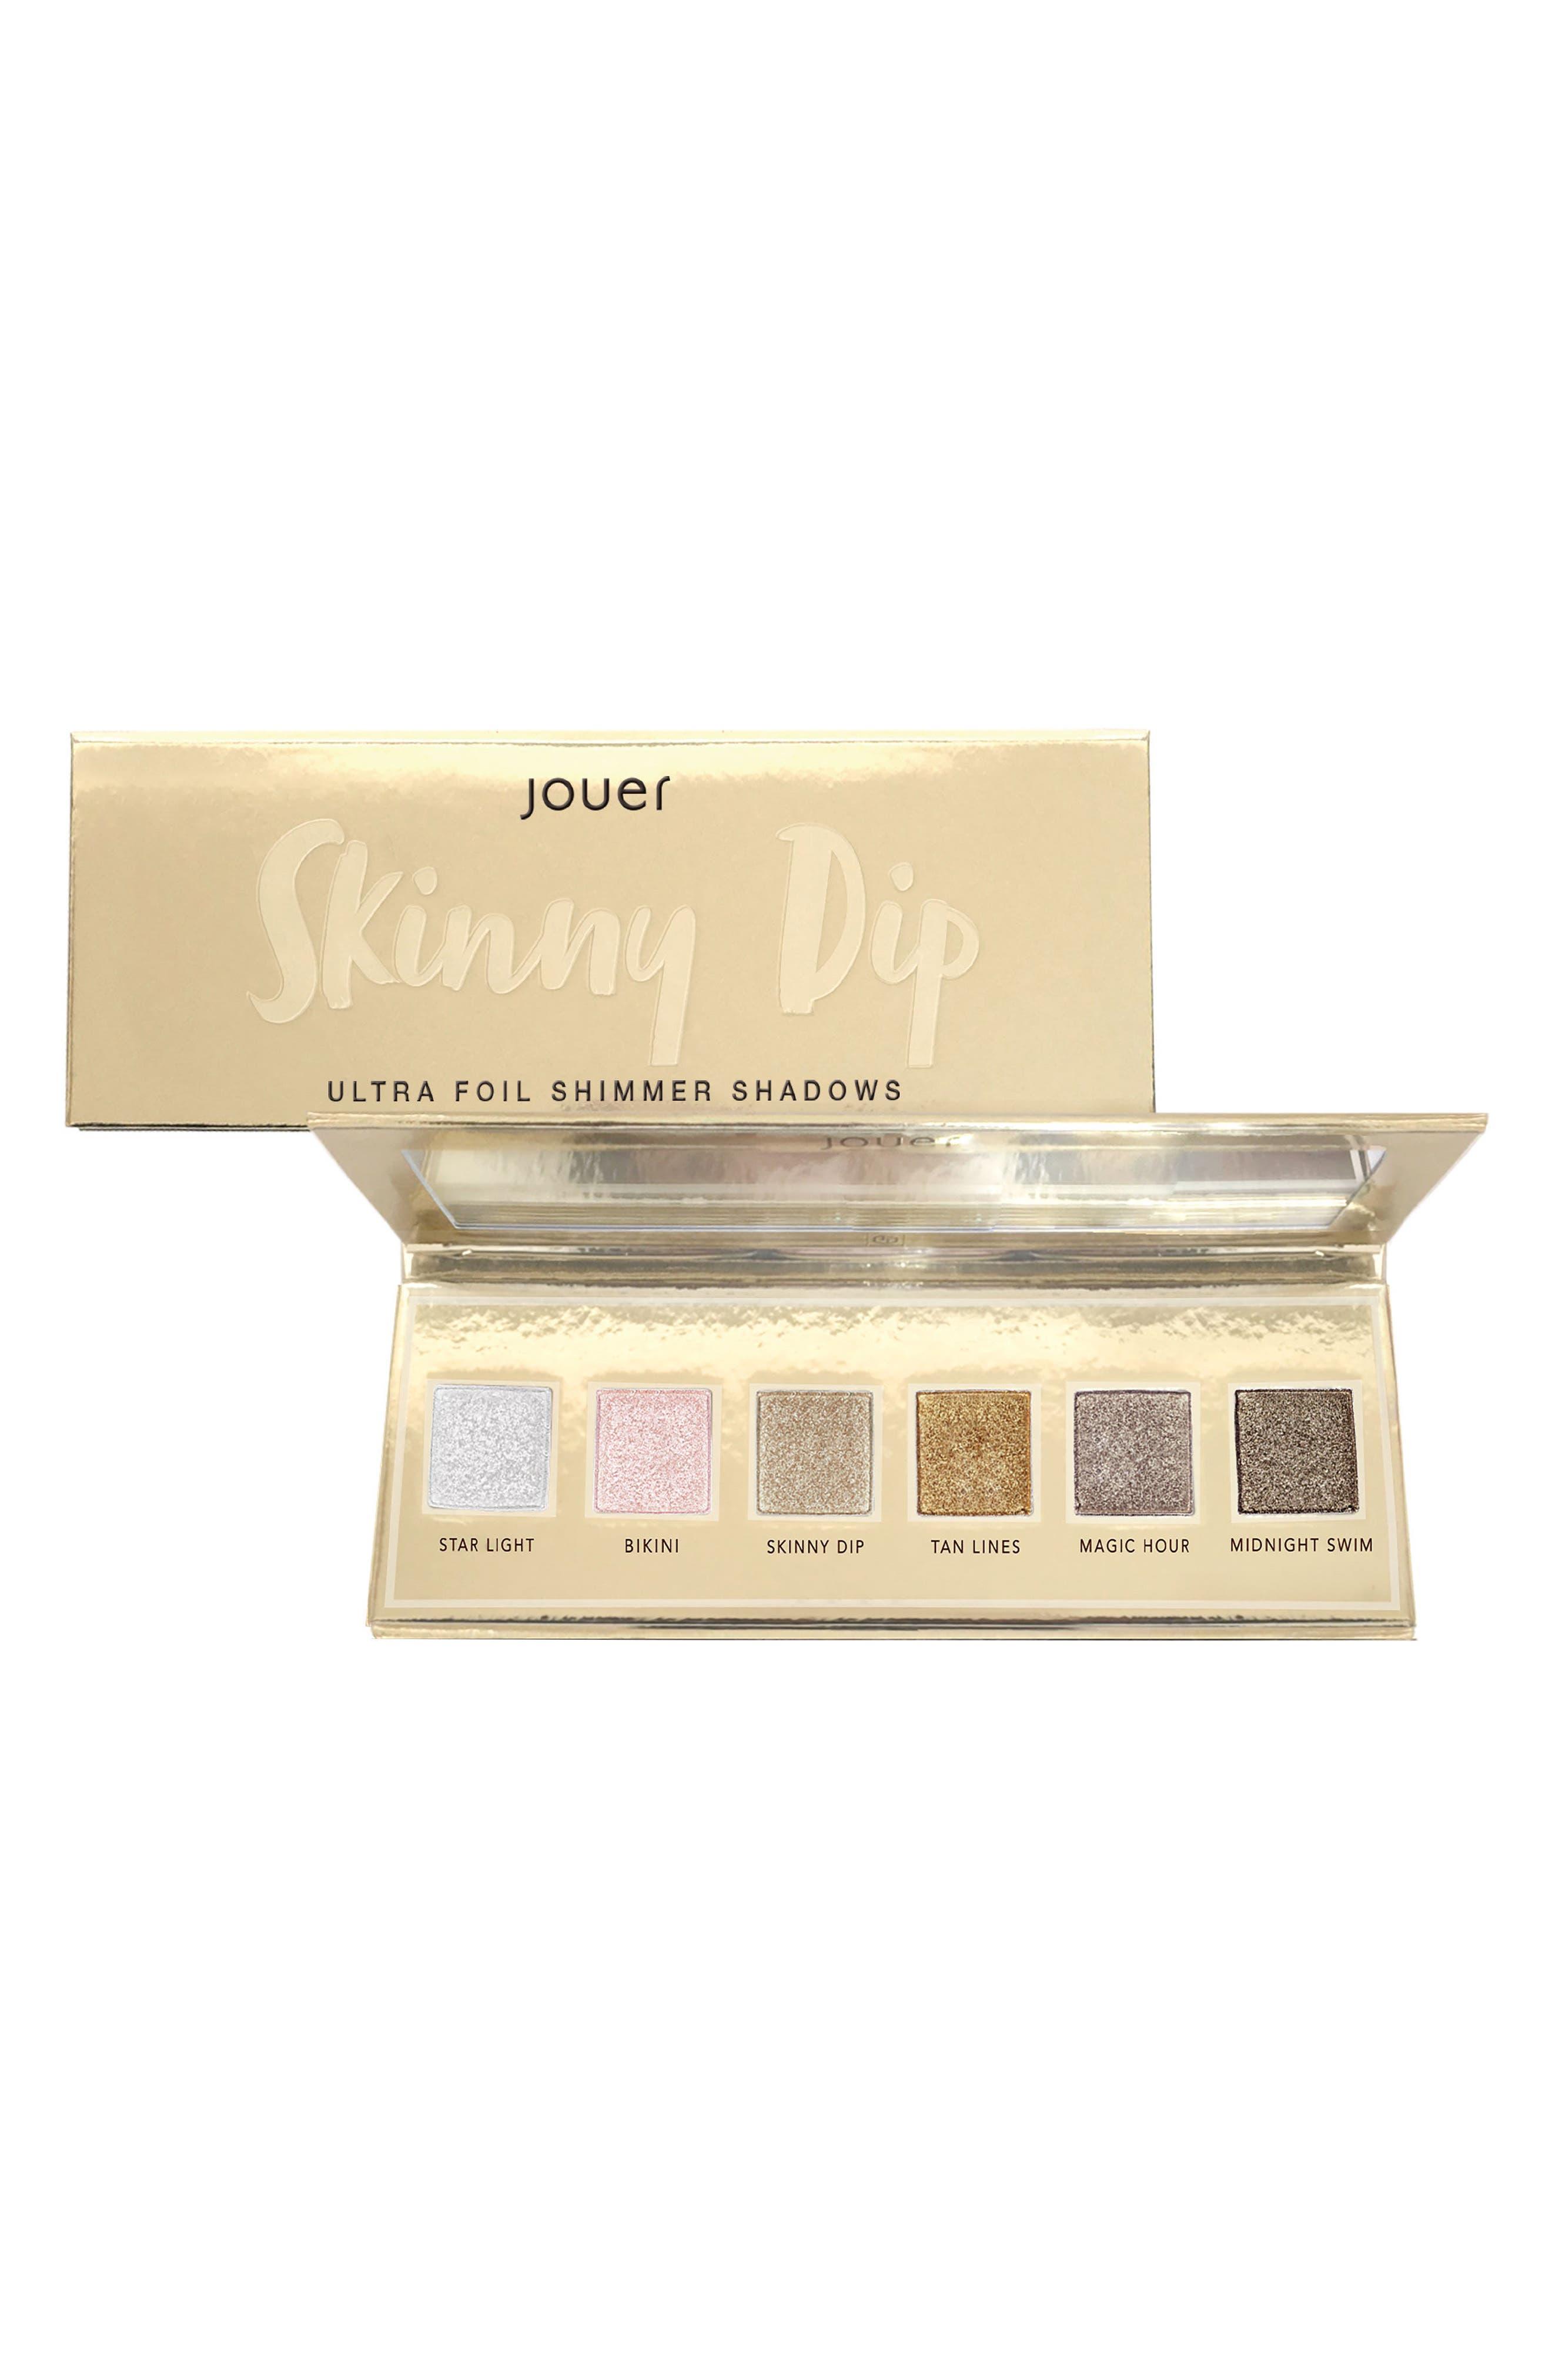 Alternate Image 1 Selected - Jouer Skinny Dip Ultra Foil Shimmer Shadows Palette